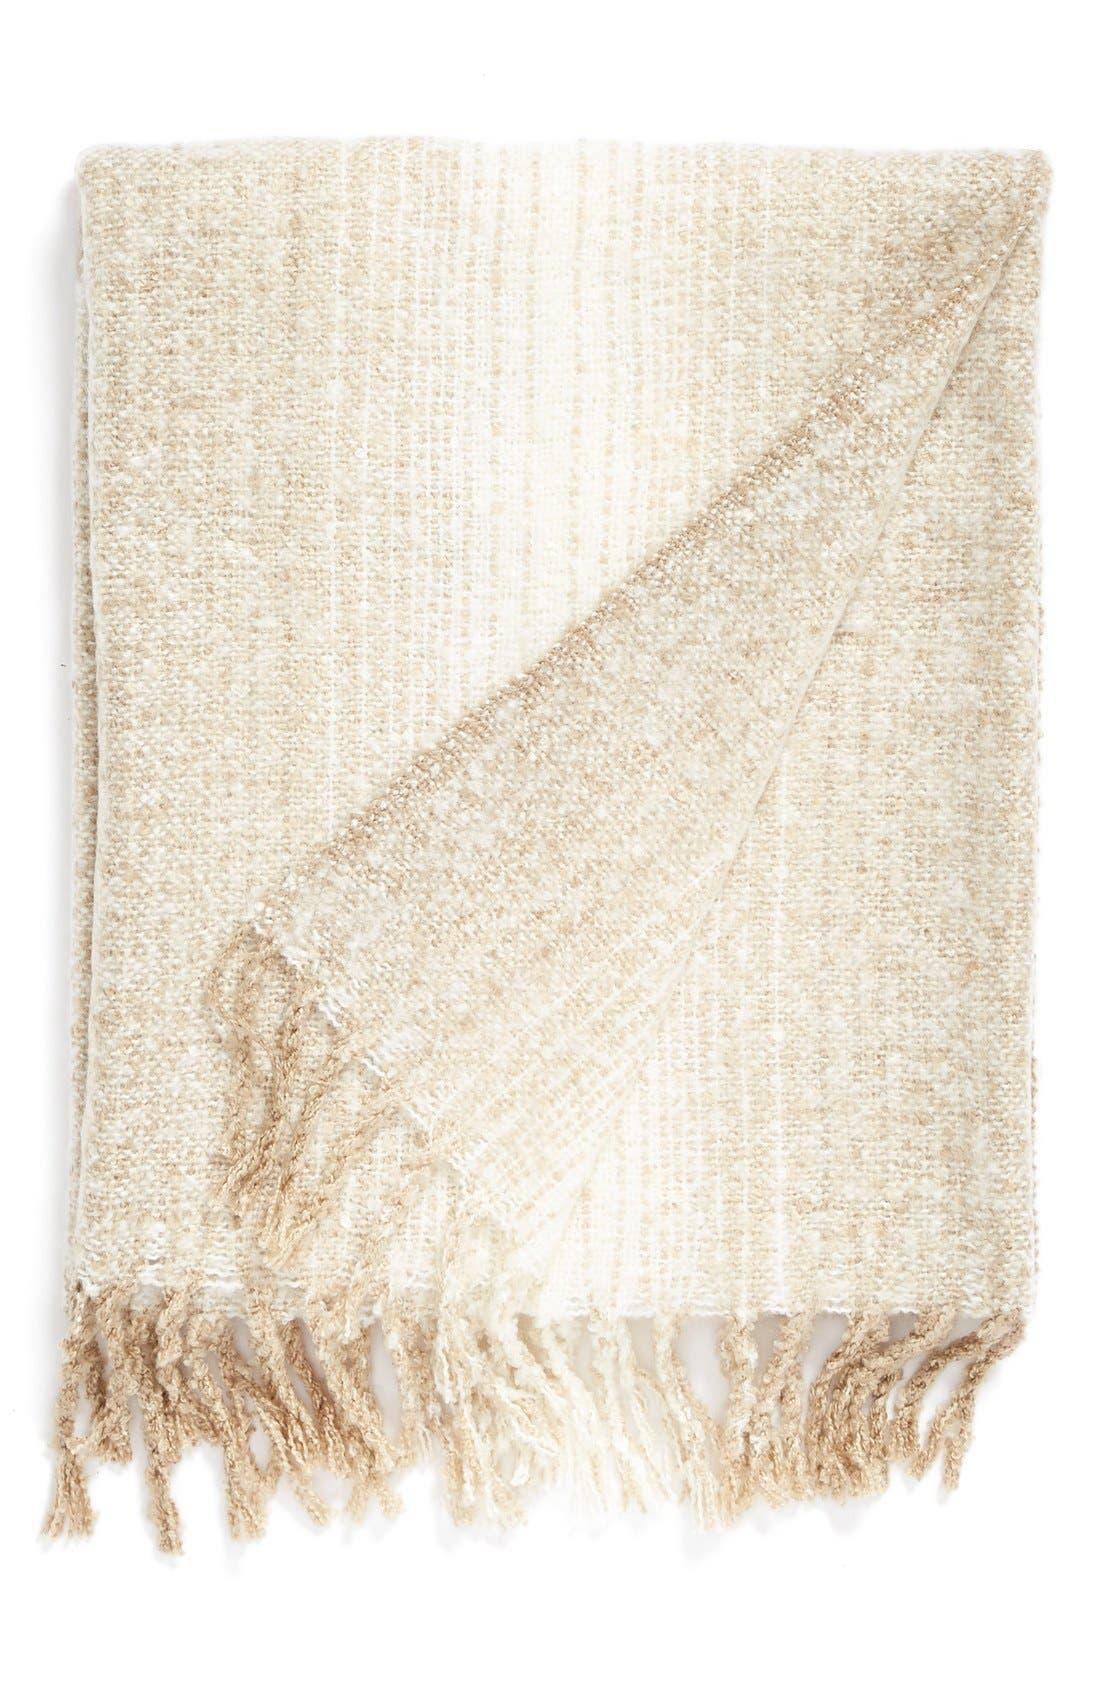 Alternate Image 1 Selected - Nordstrom at Home Brushed Ombré Throw Blanket